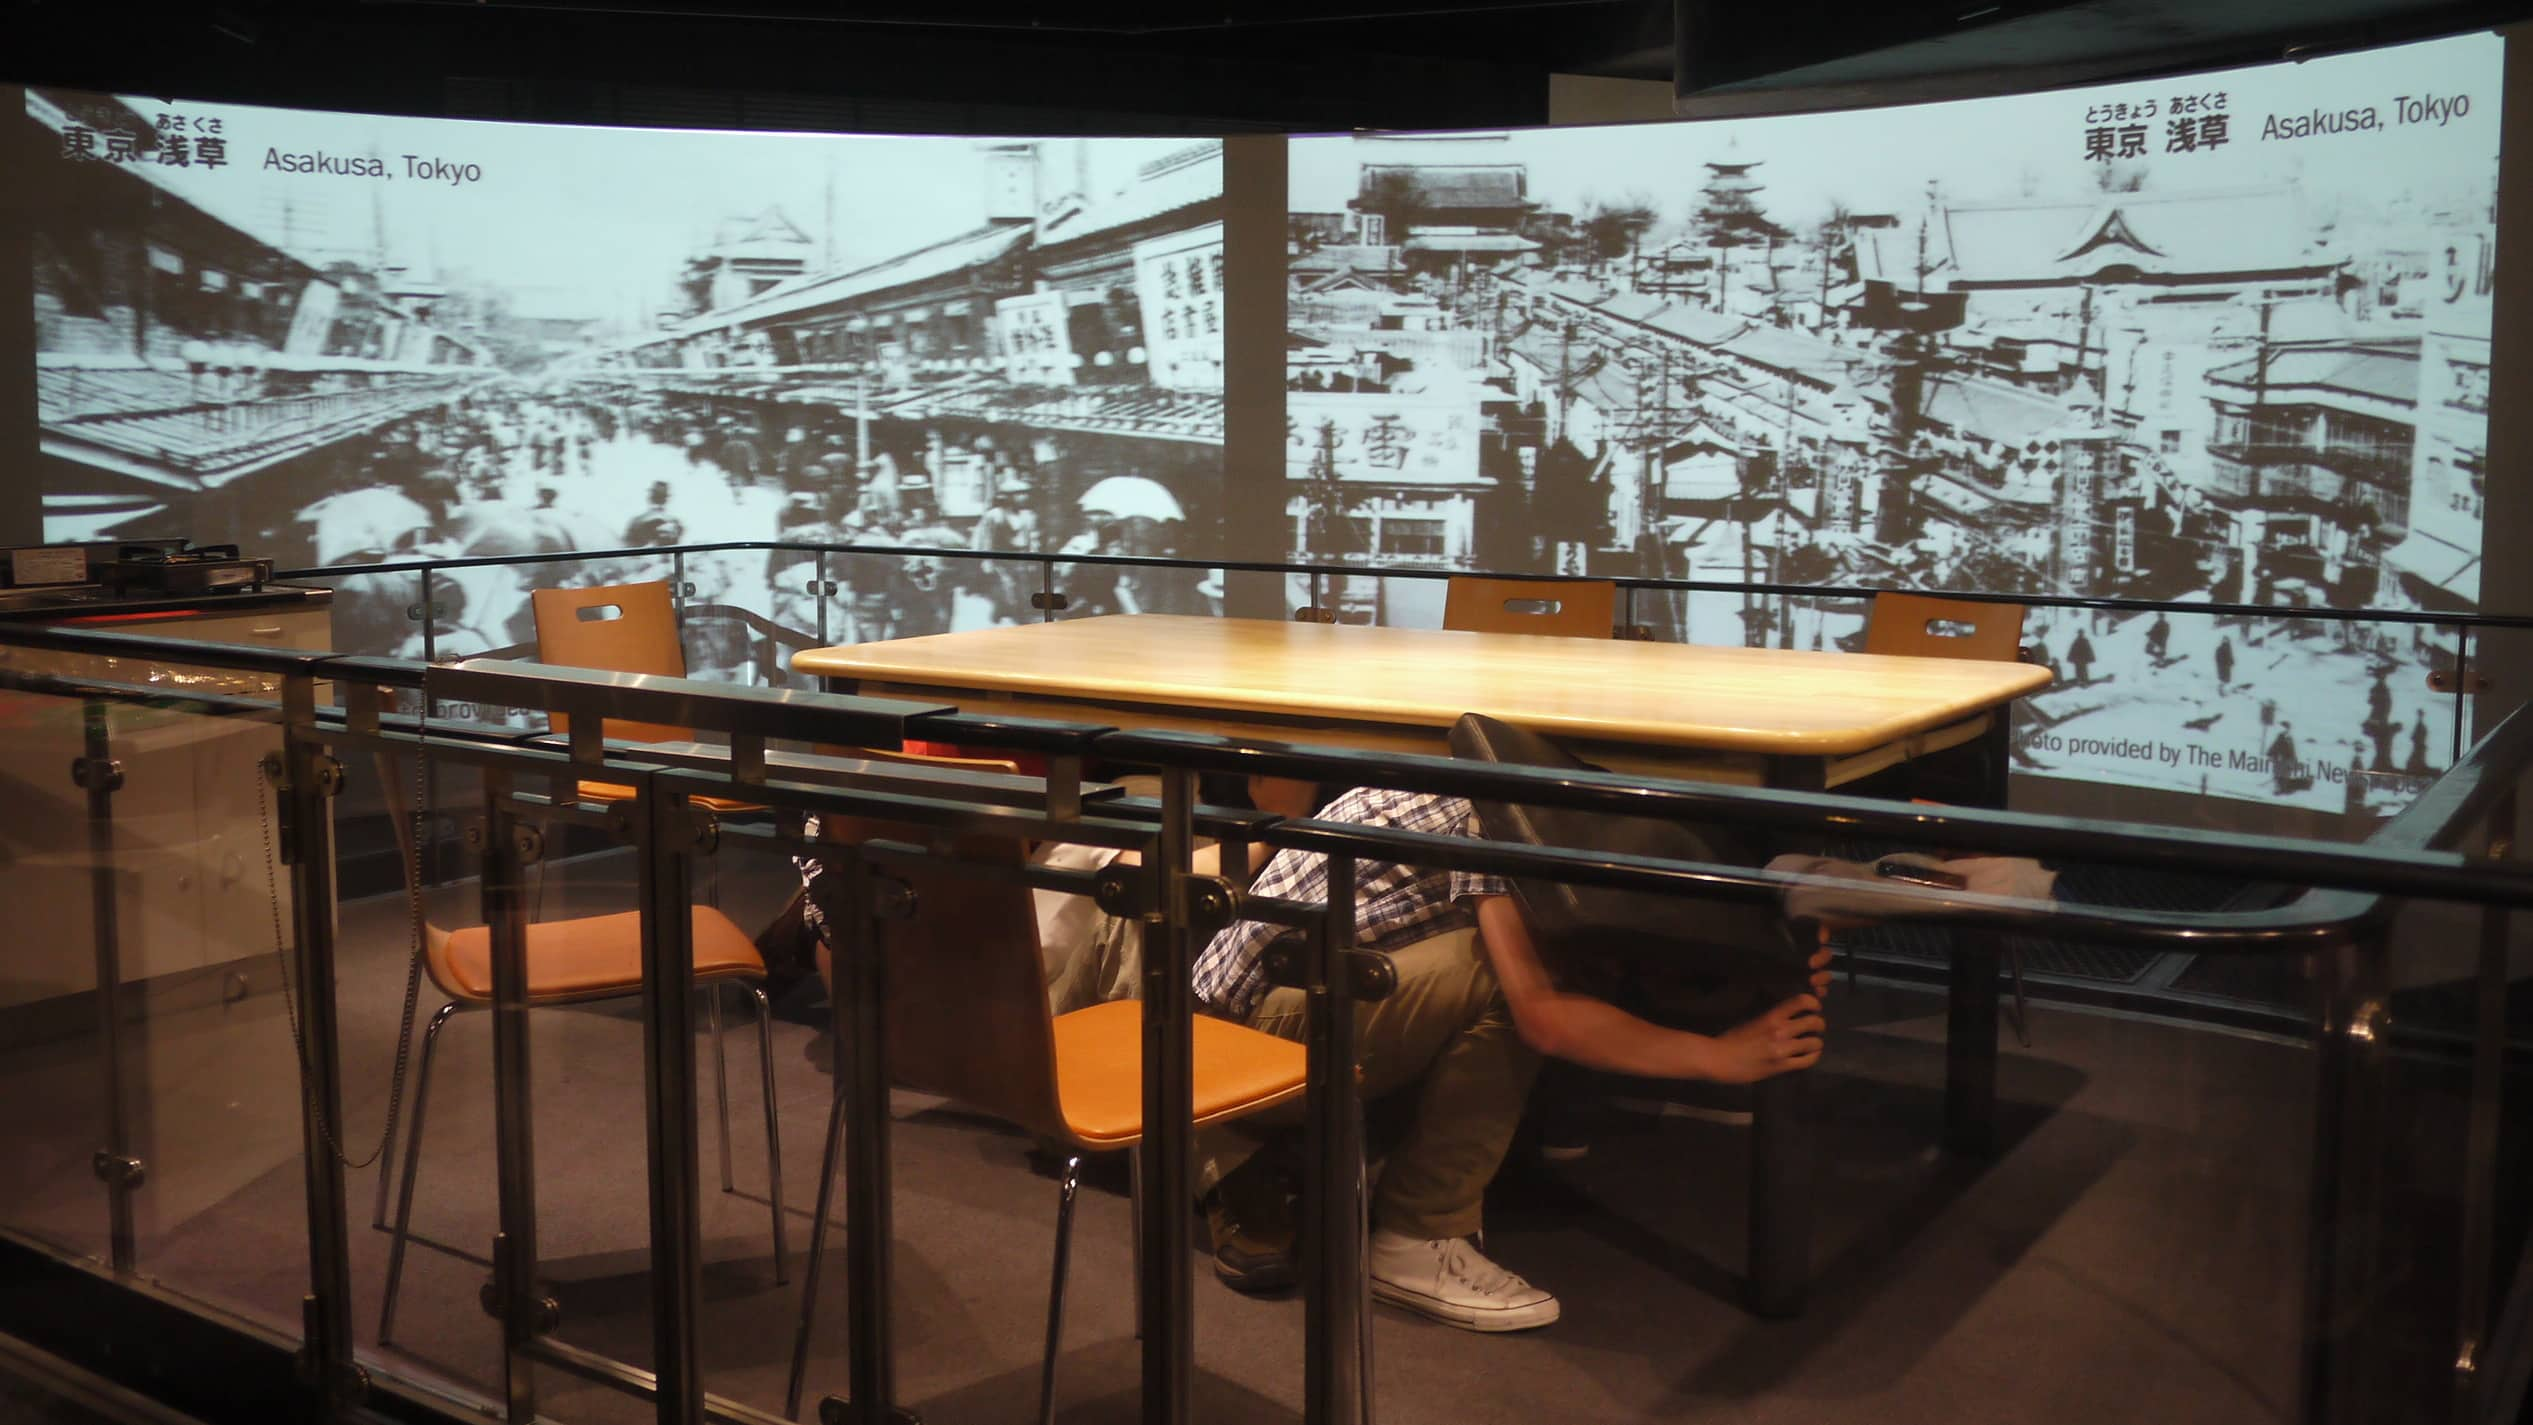 Ikebukuro Life Safety Learning Center – Earthquake